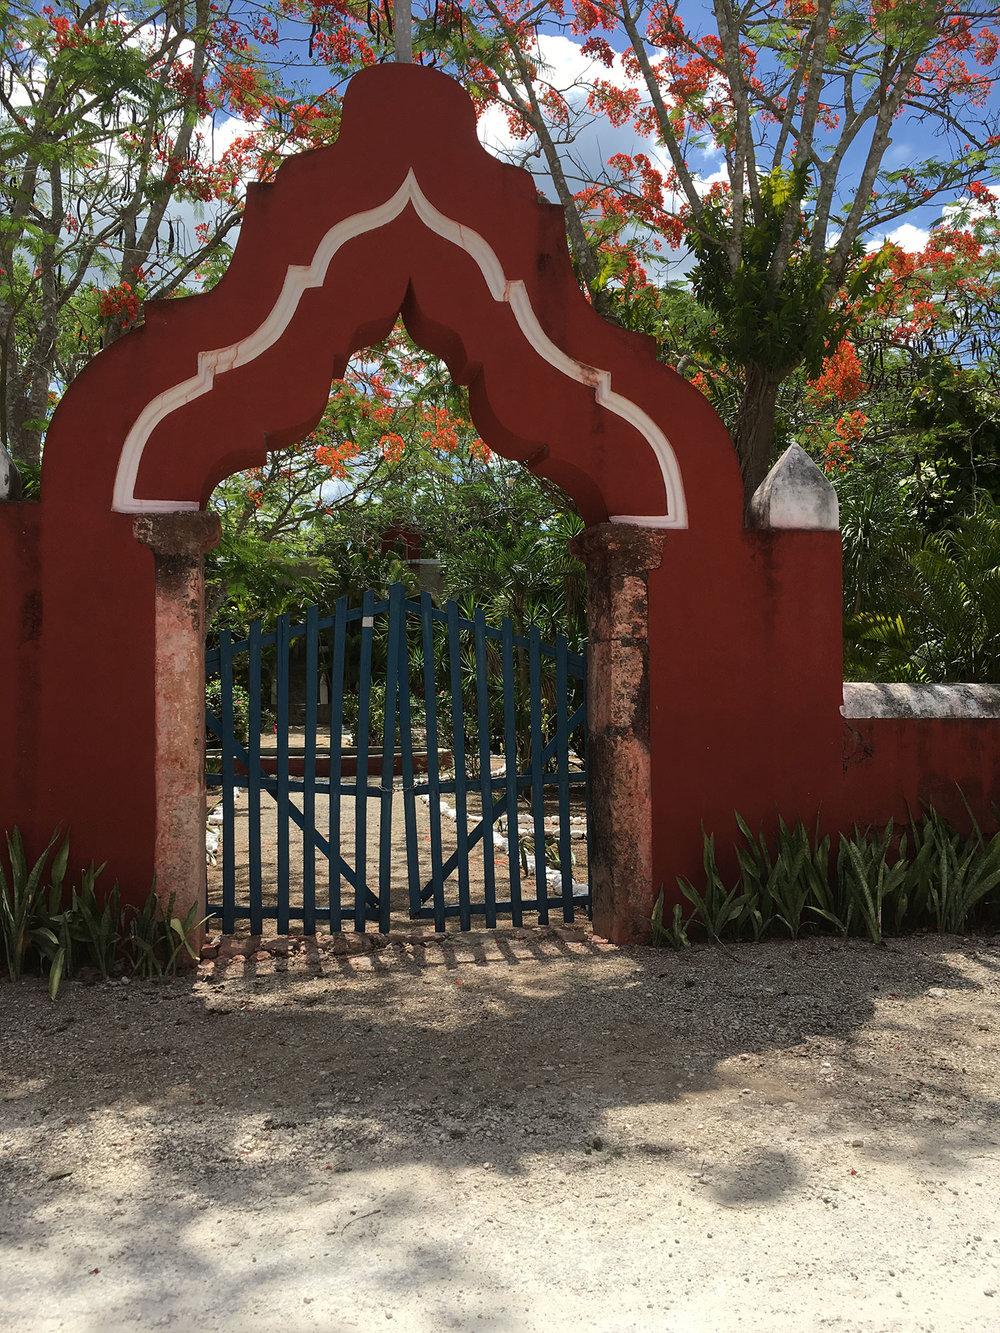 The entry gate to the Hacienda San Antonio Dzina, south of the cenote.